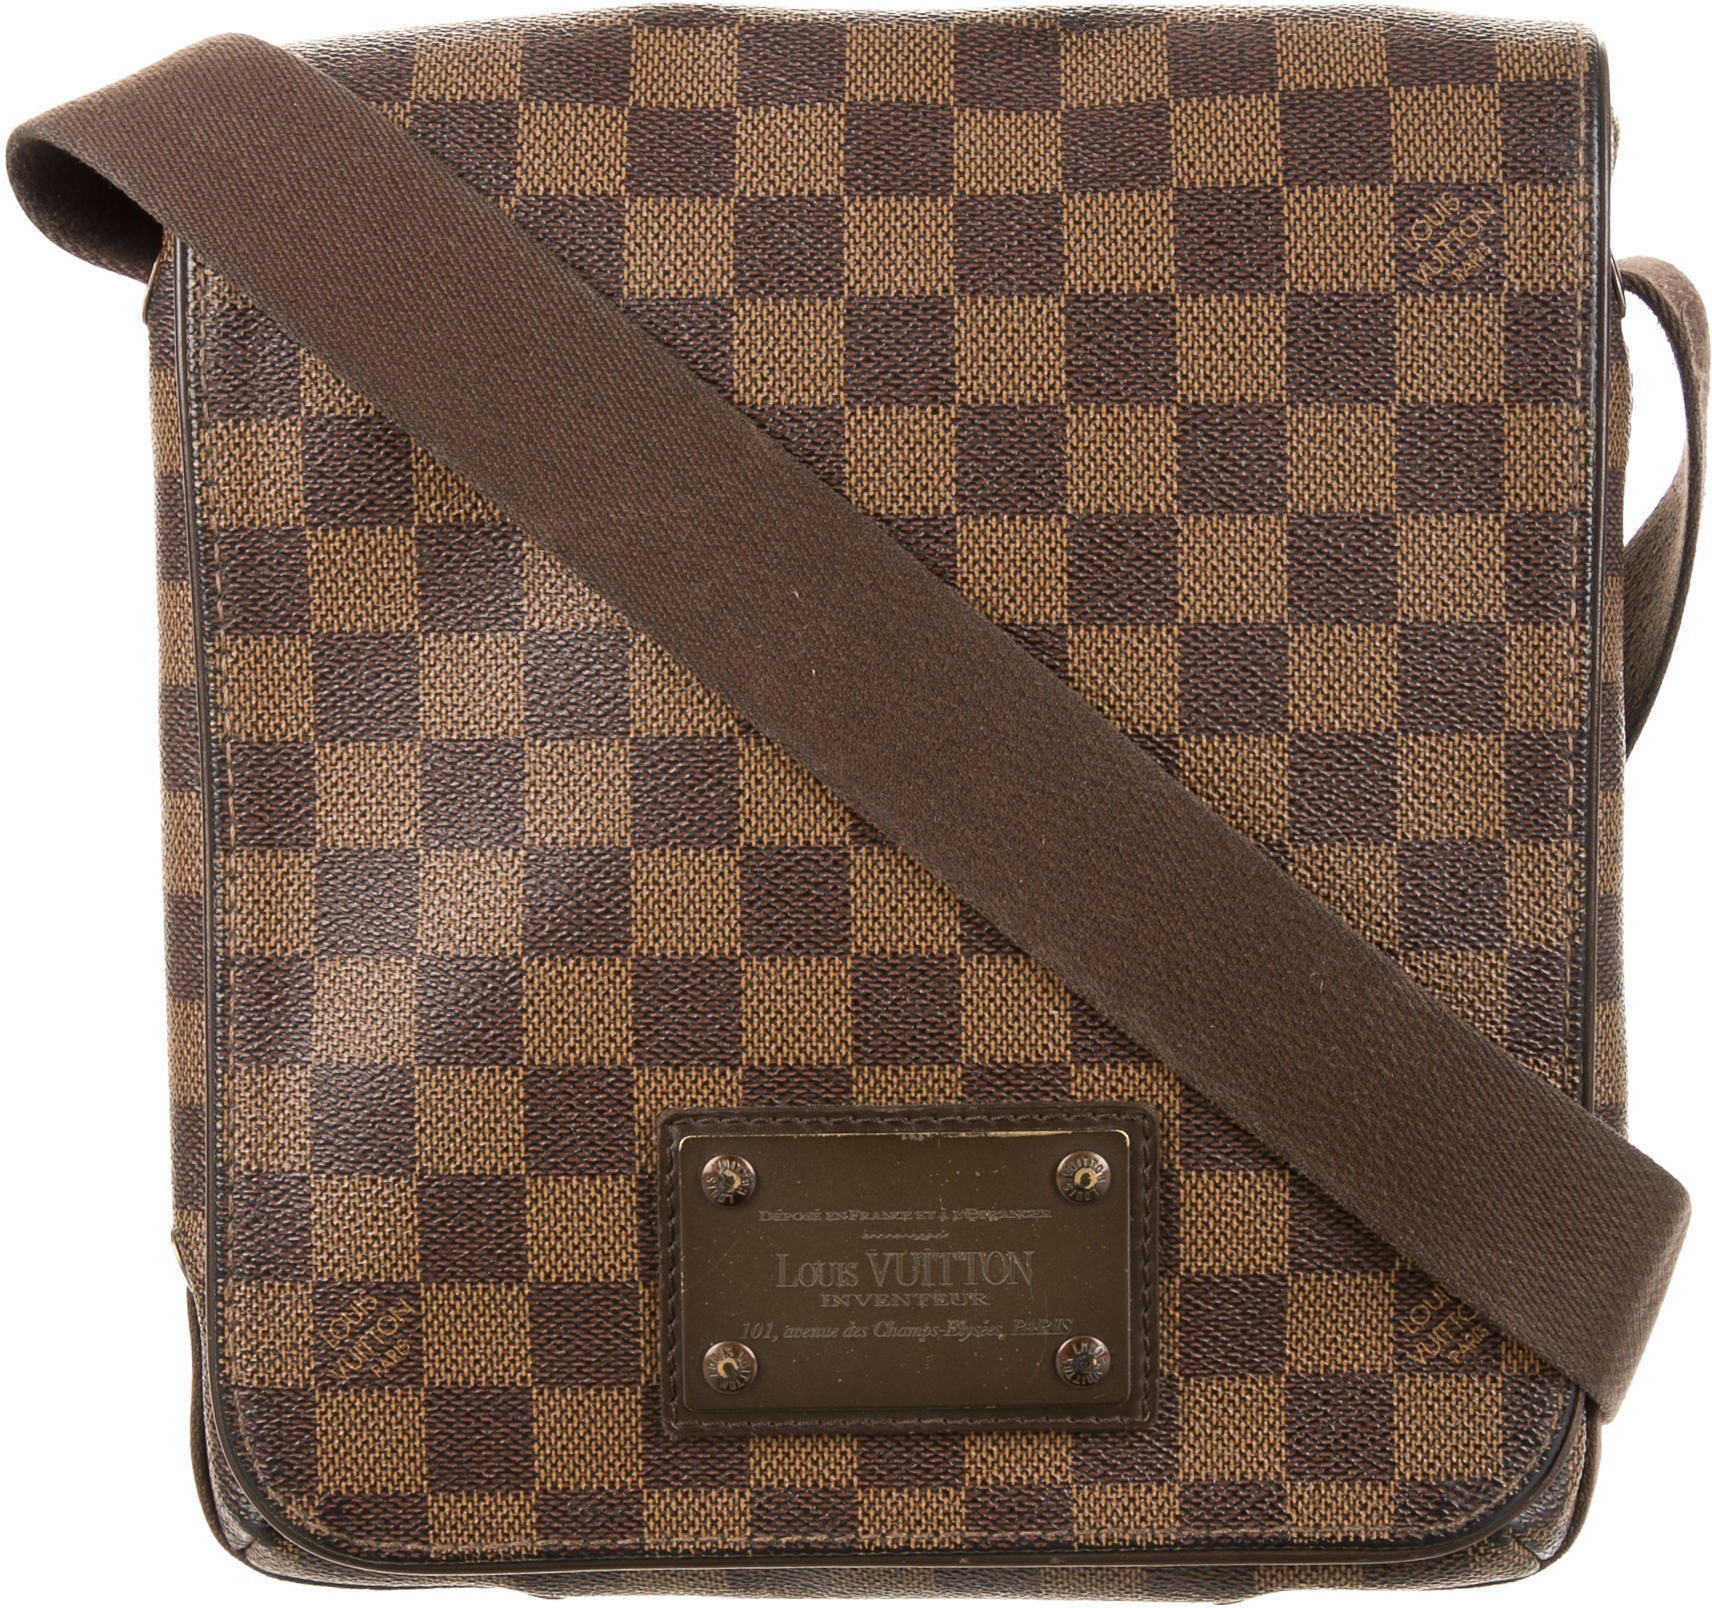 Louis Vuitton Messenger Brooklyn Damier Ebene PM Brown